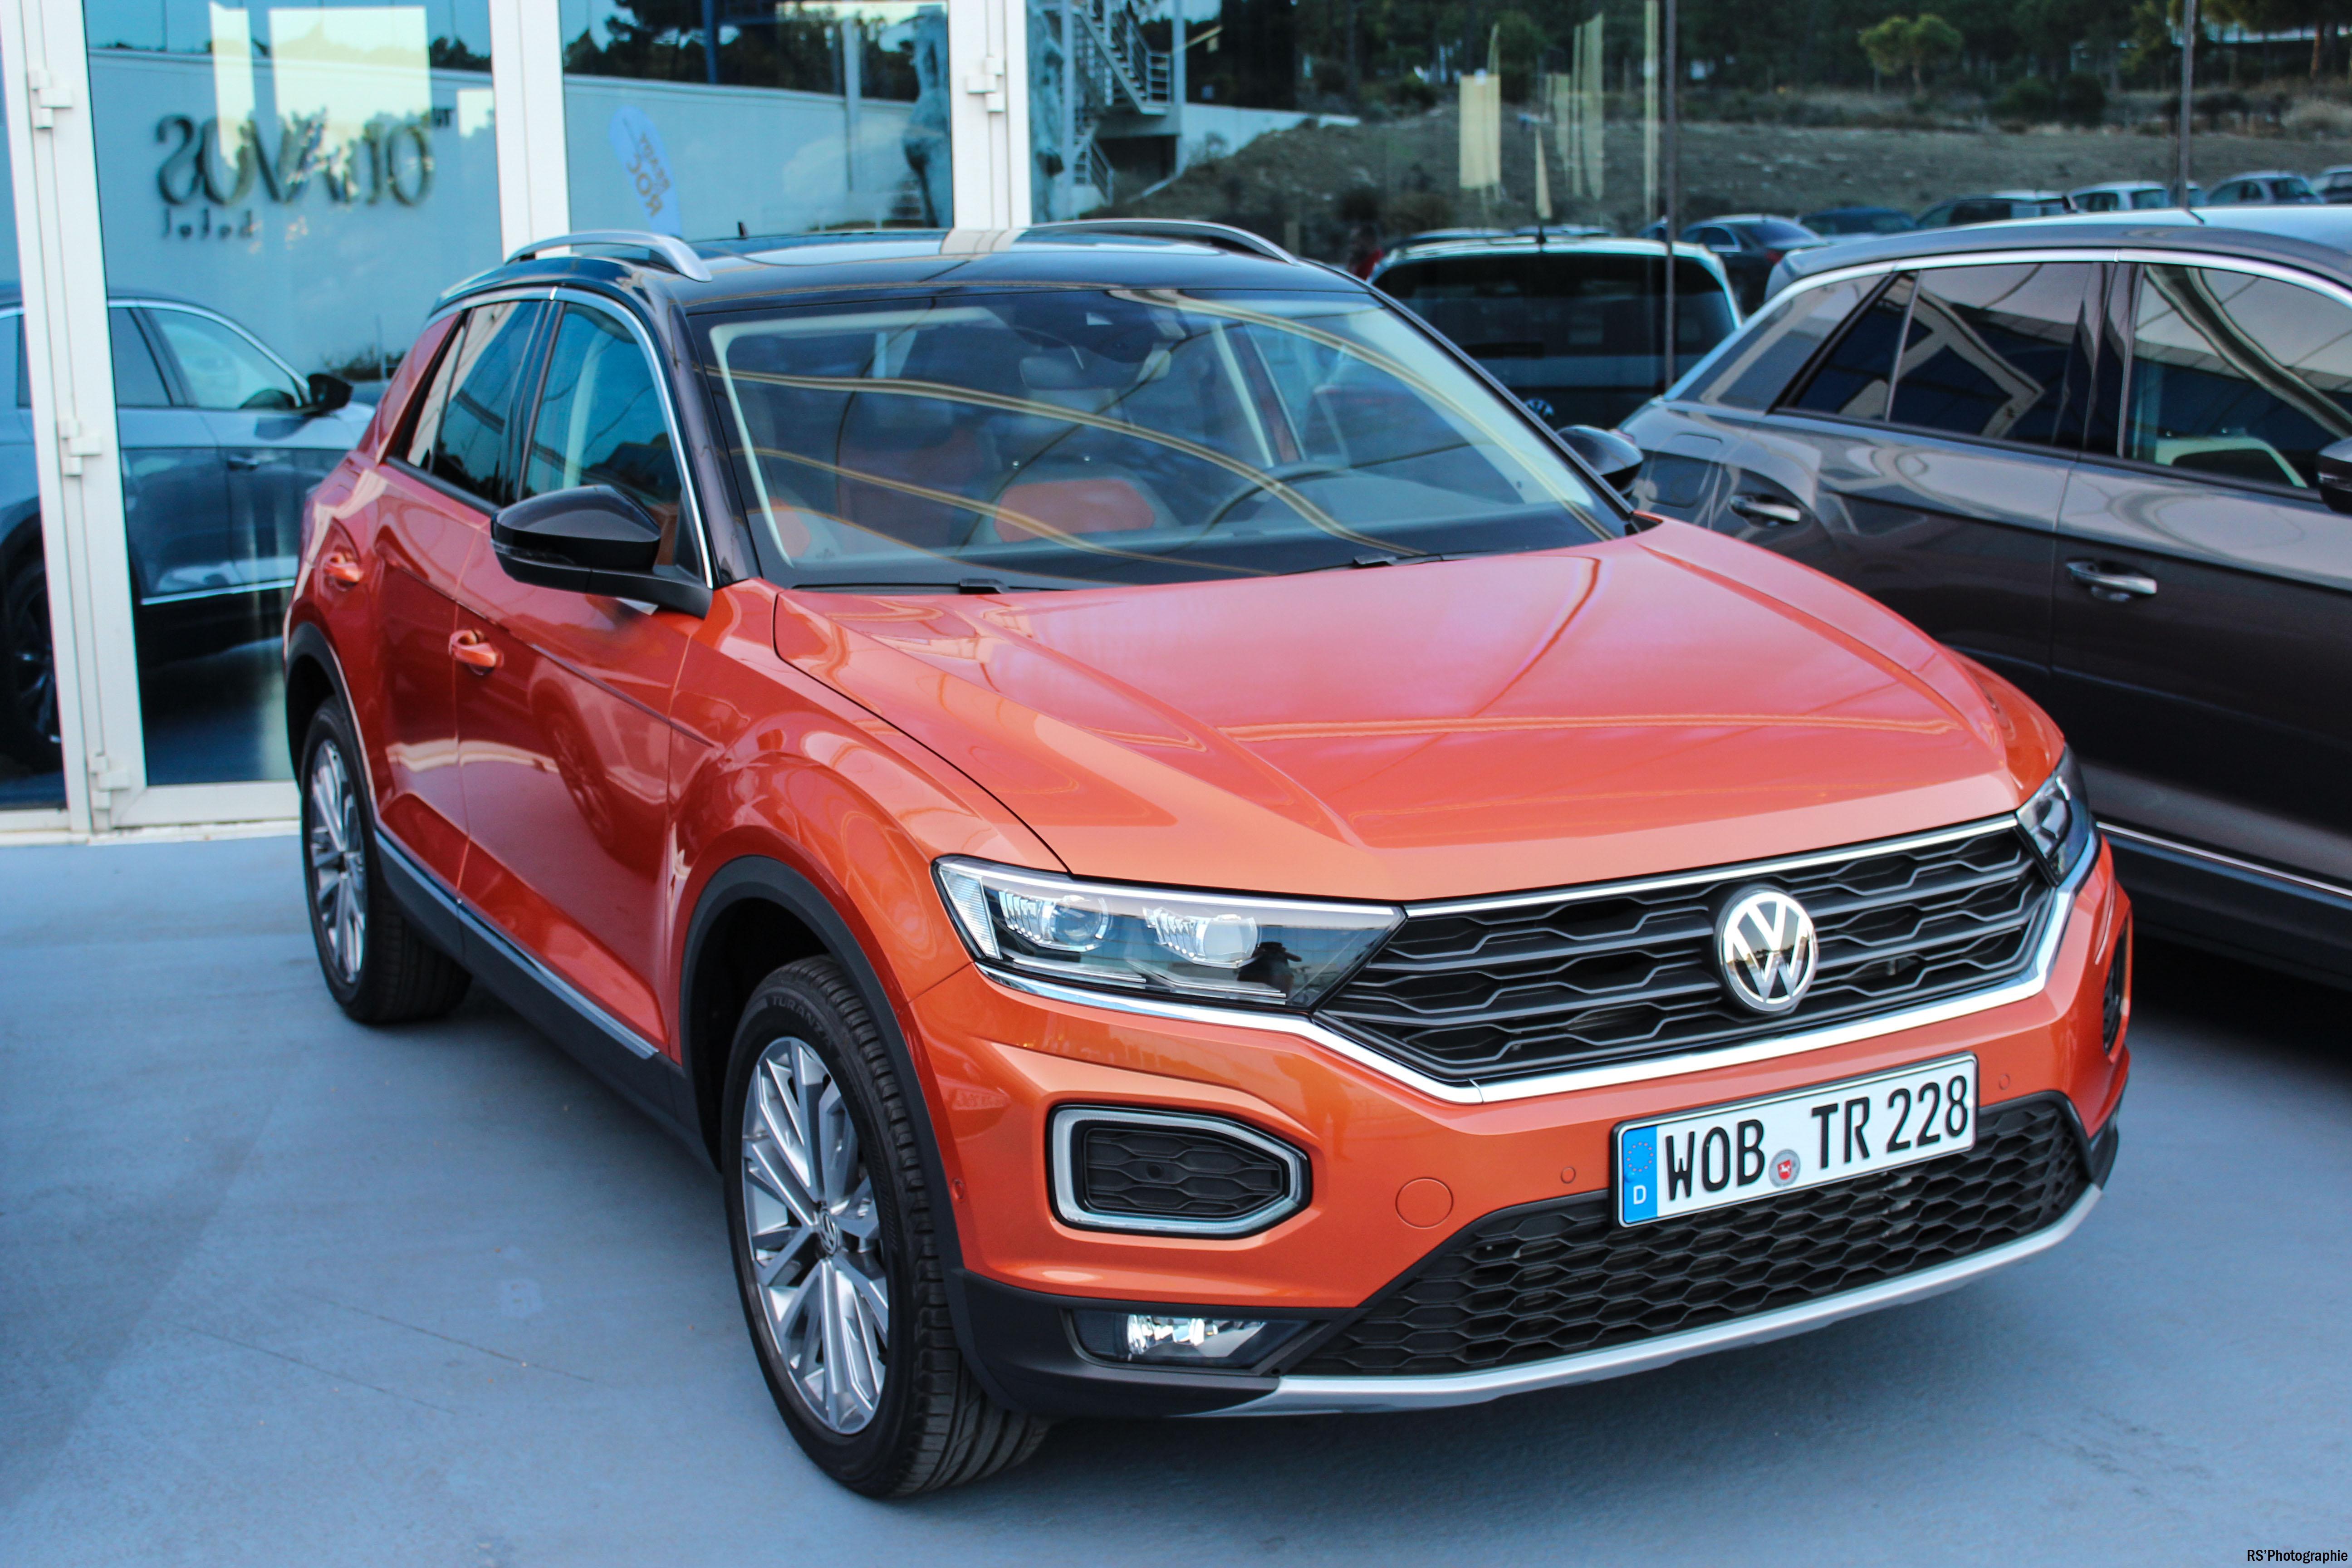 Volkswagentroc61-vw-t-roc-avant-front-Arnaud Demasier-RSPhotographie